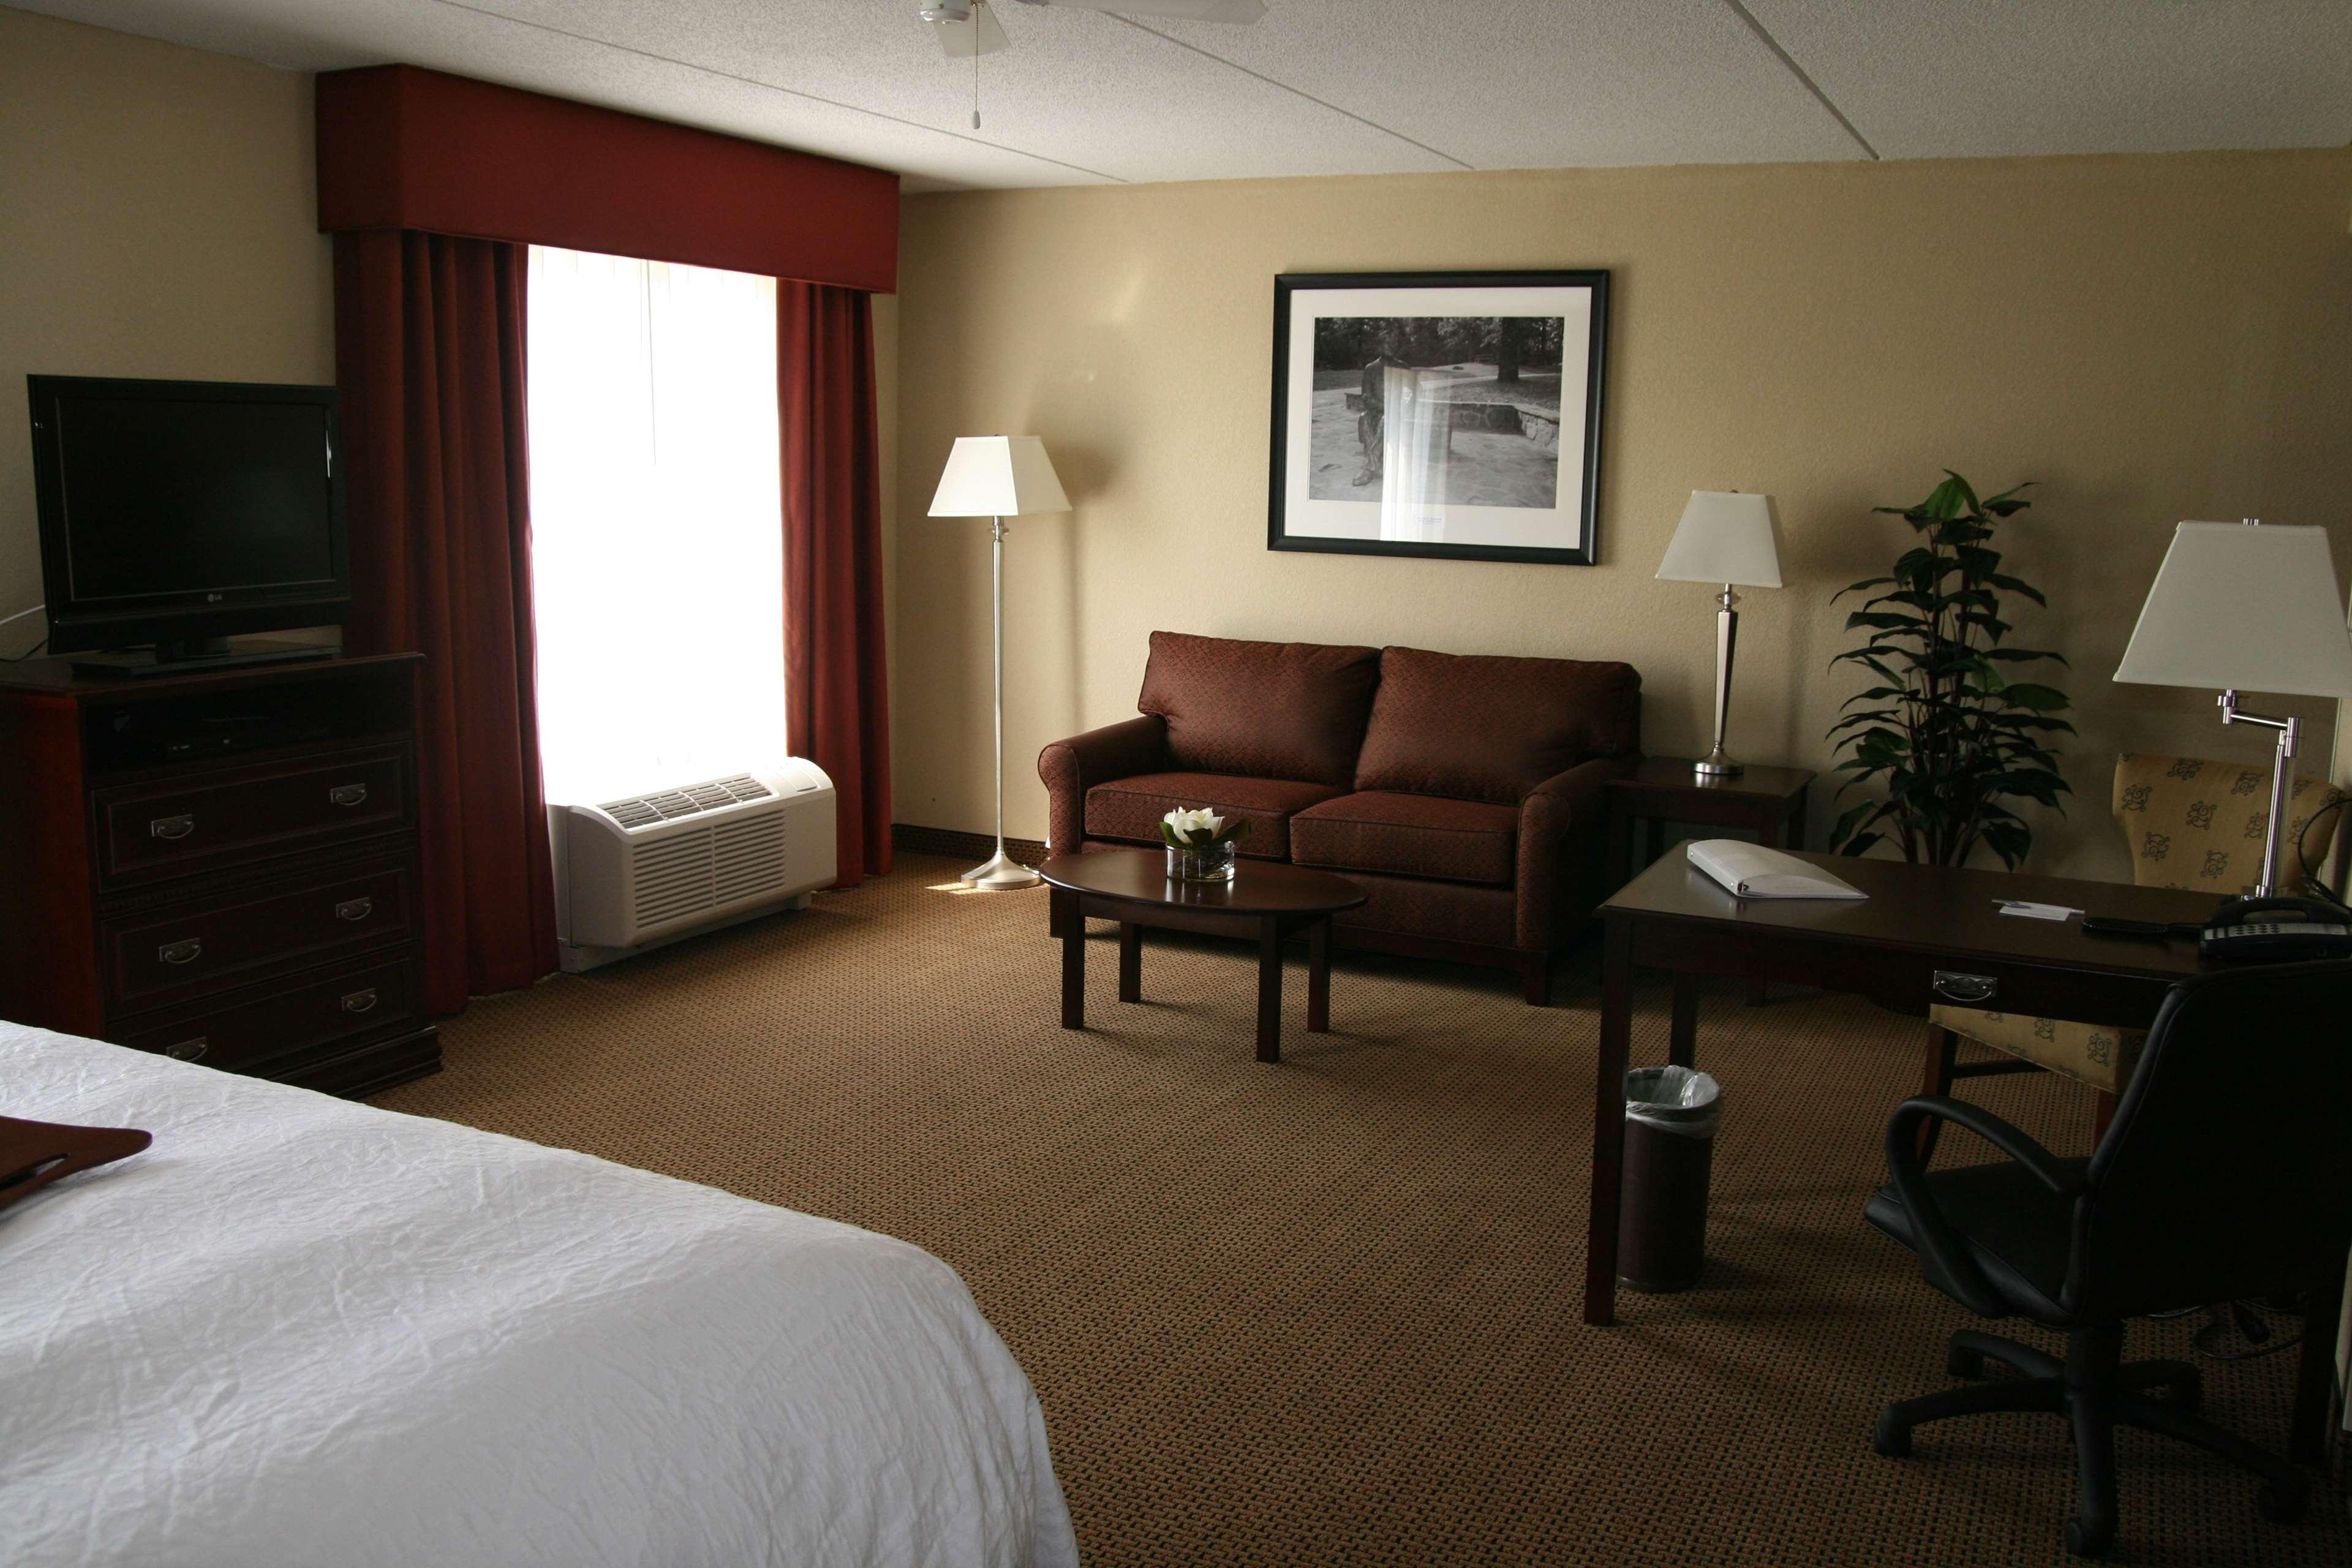 Hampton Inn & Suites Lanett-West Point image 37